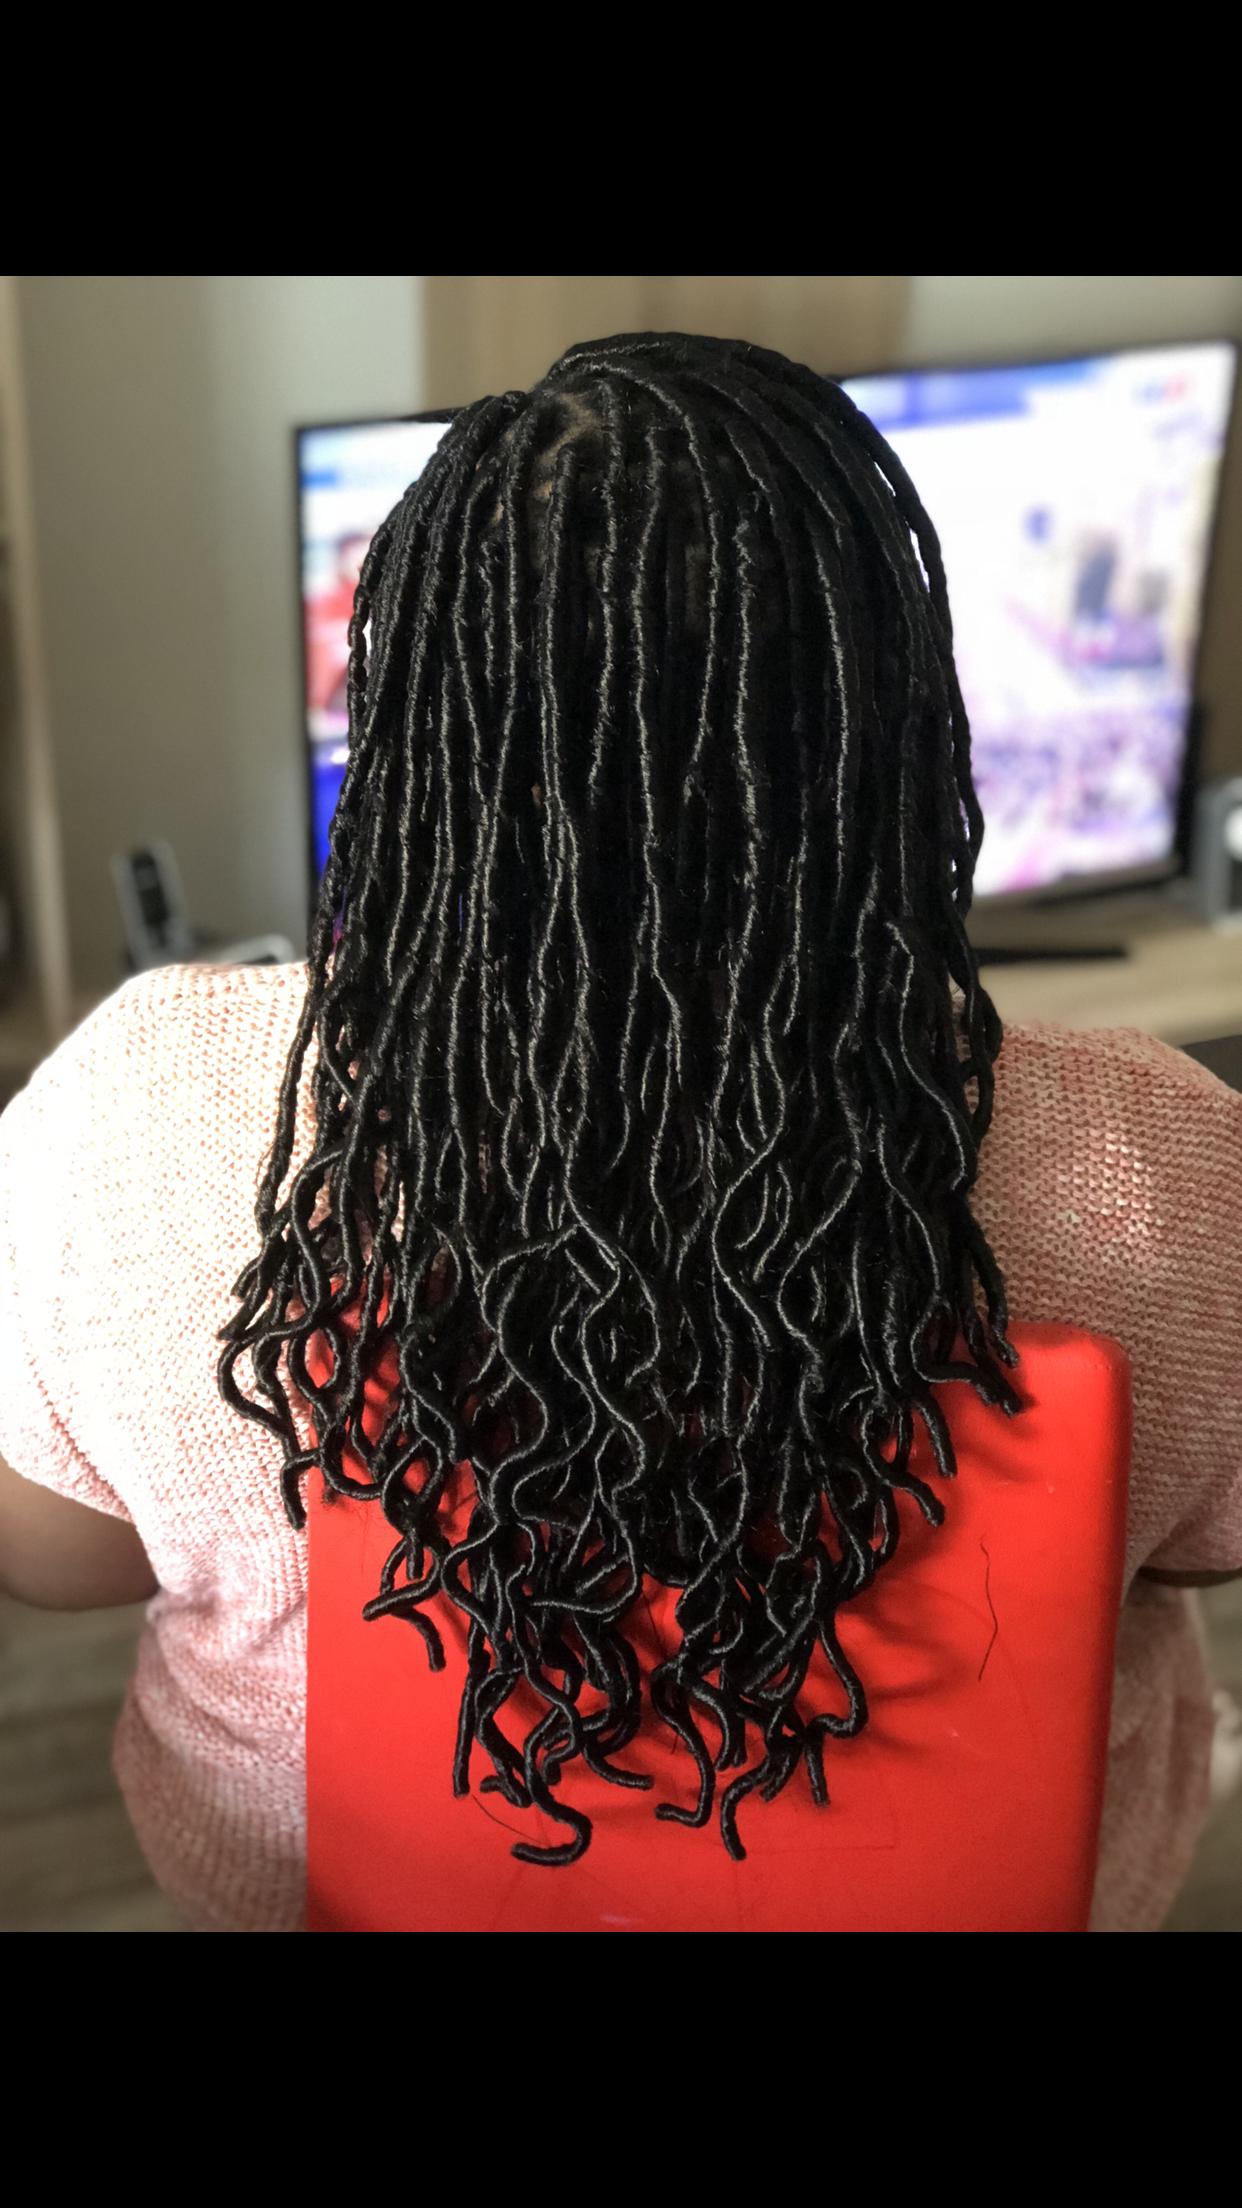 salon de coiffure afro tresse tresses box braids crochet braids vanilles tissages paris 75 77 78 91 92 93 94 95 IIEFHJKU